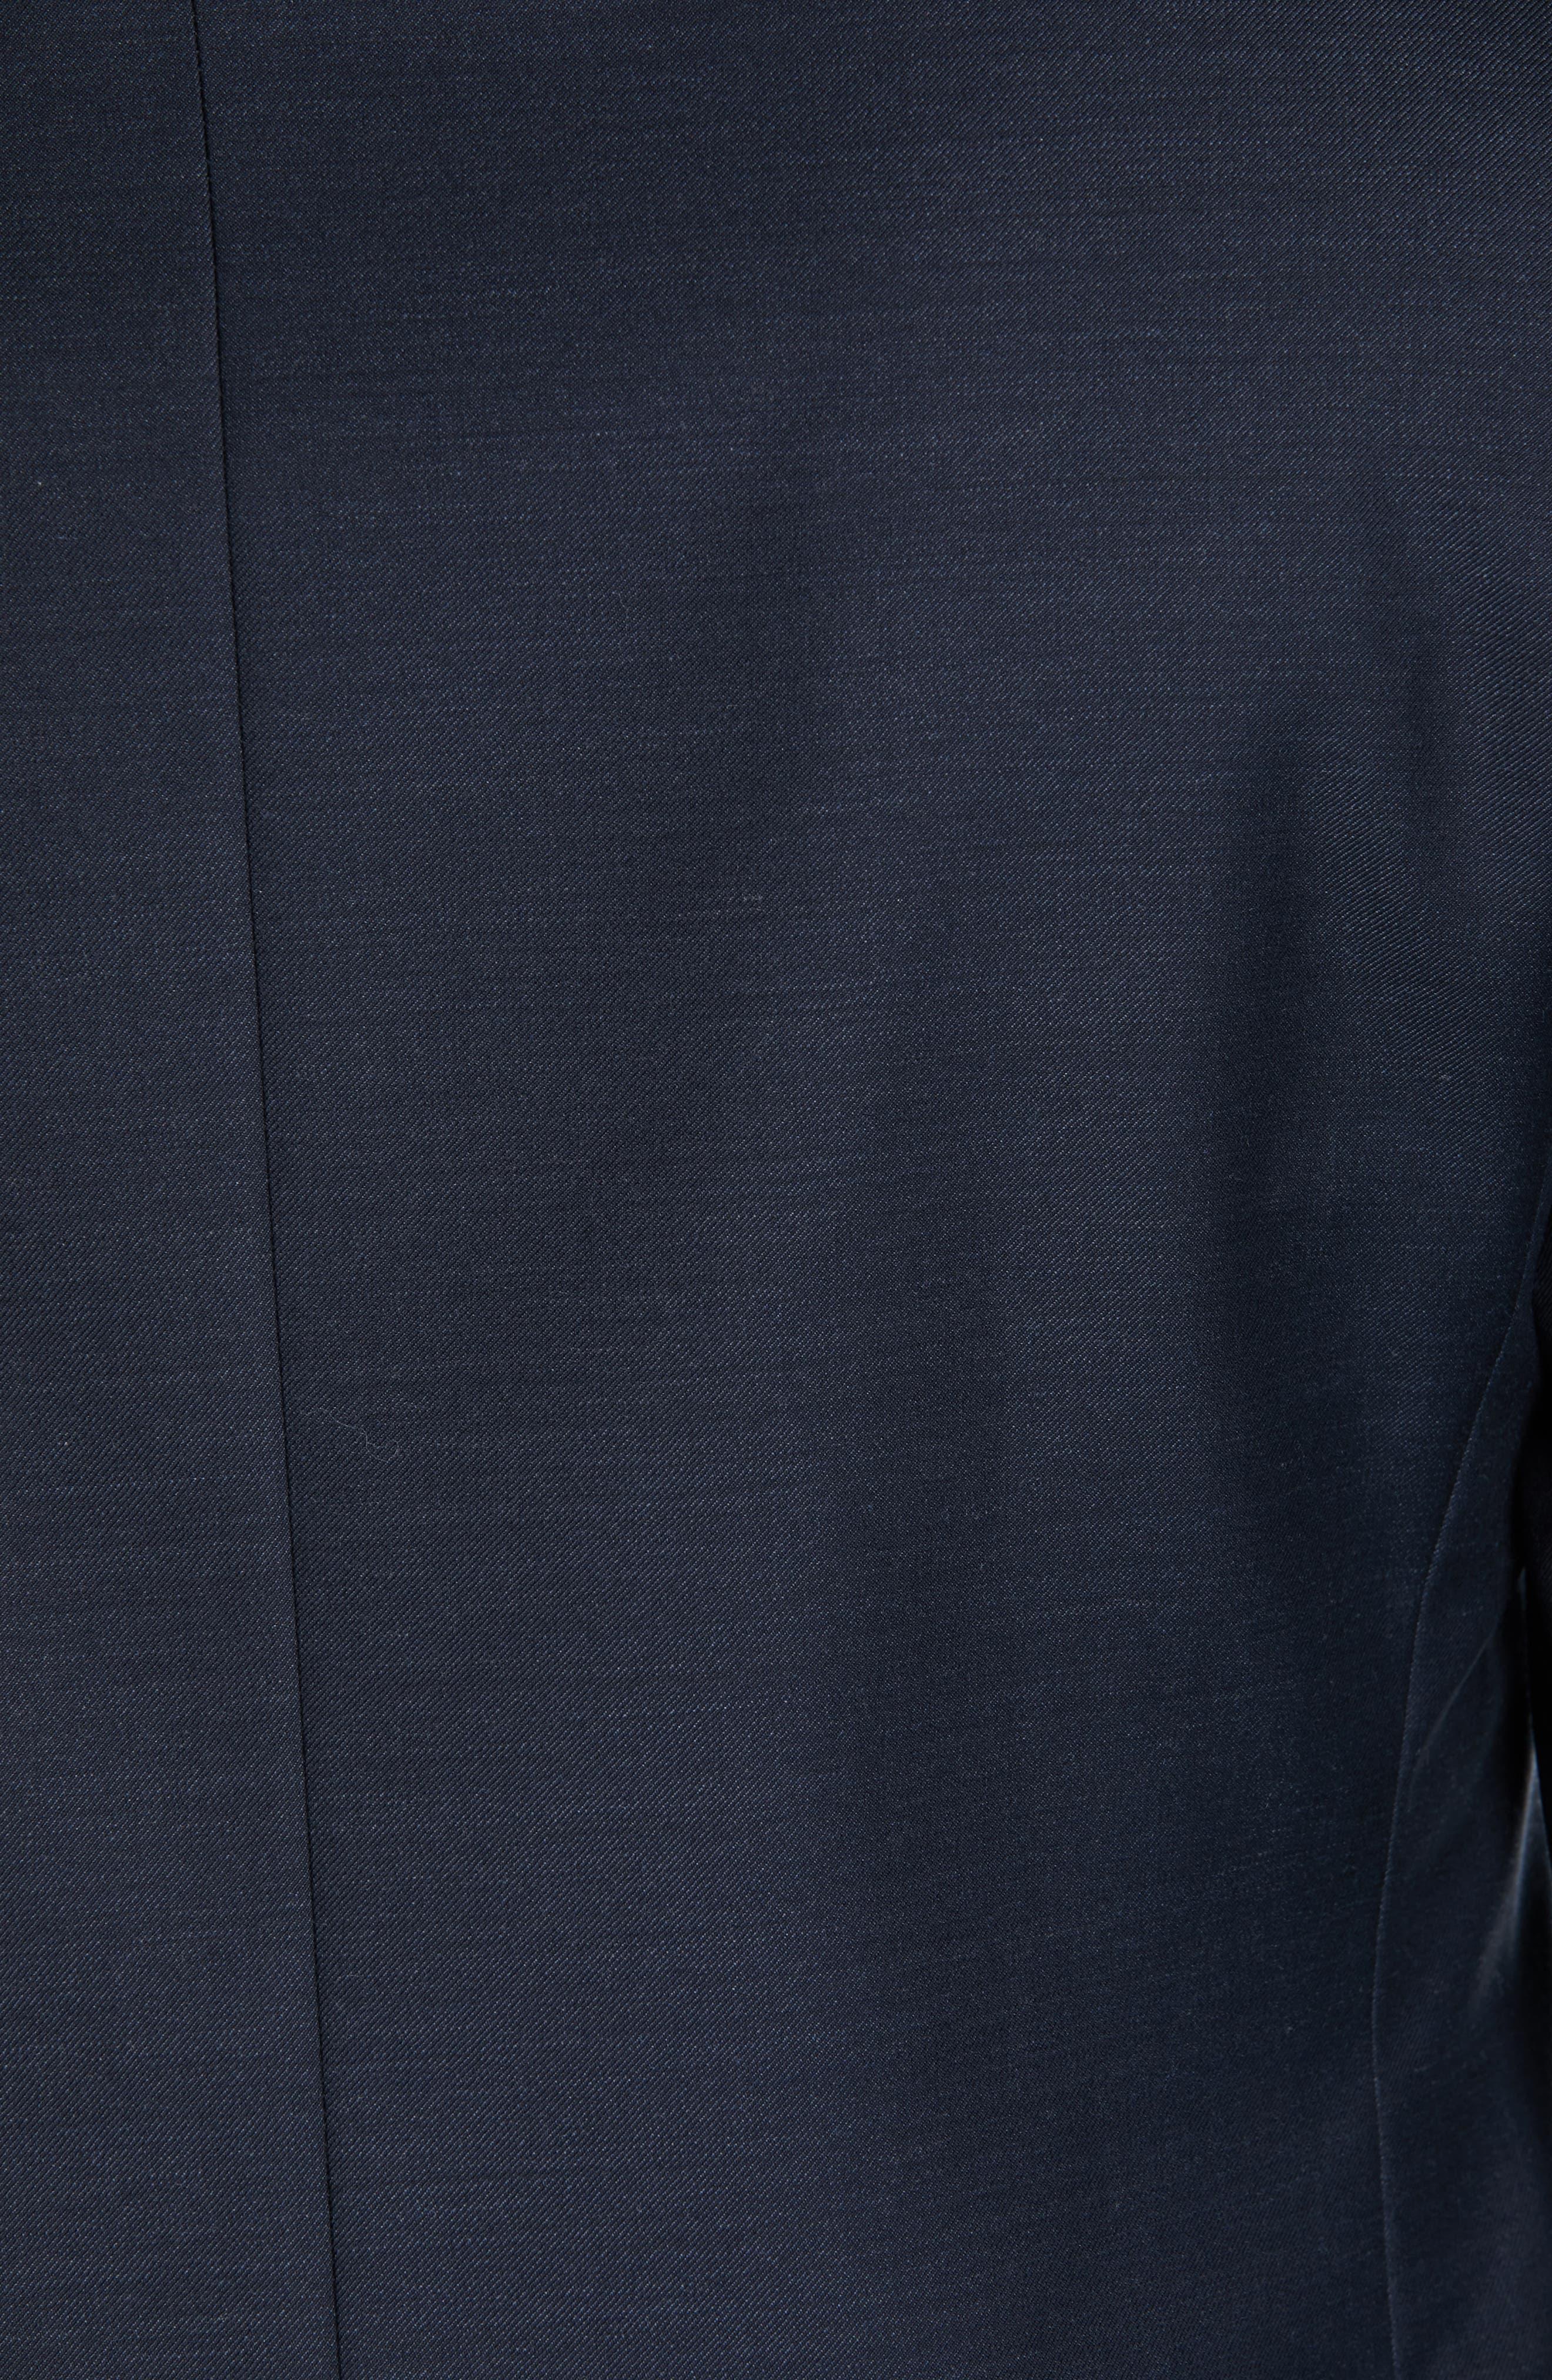 CANALI, Venieza Classic Fit Wool Tuxedo, Alternate thumbnail 7, color, NAVY